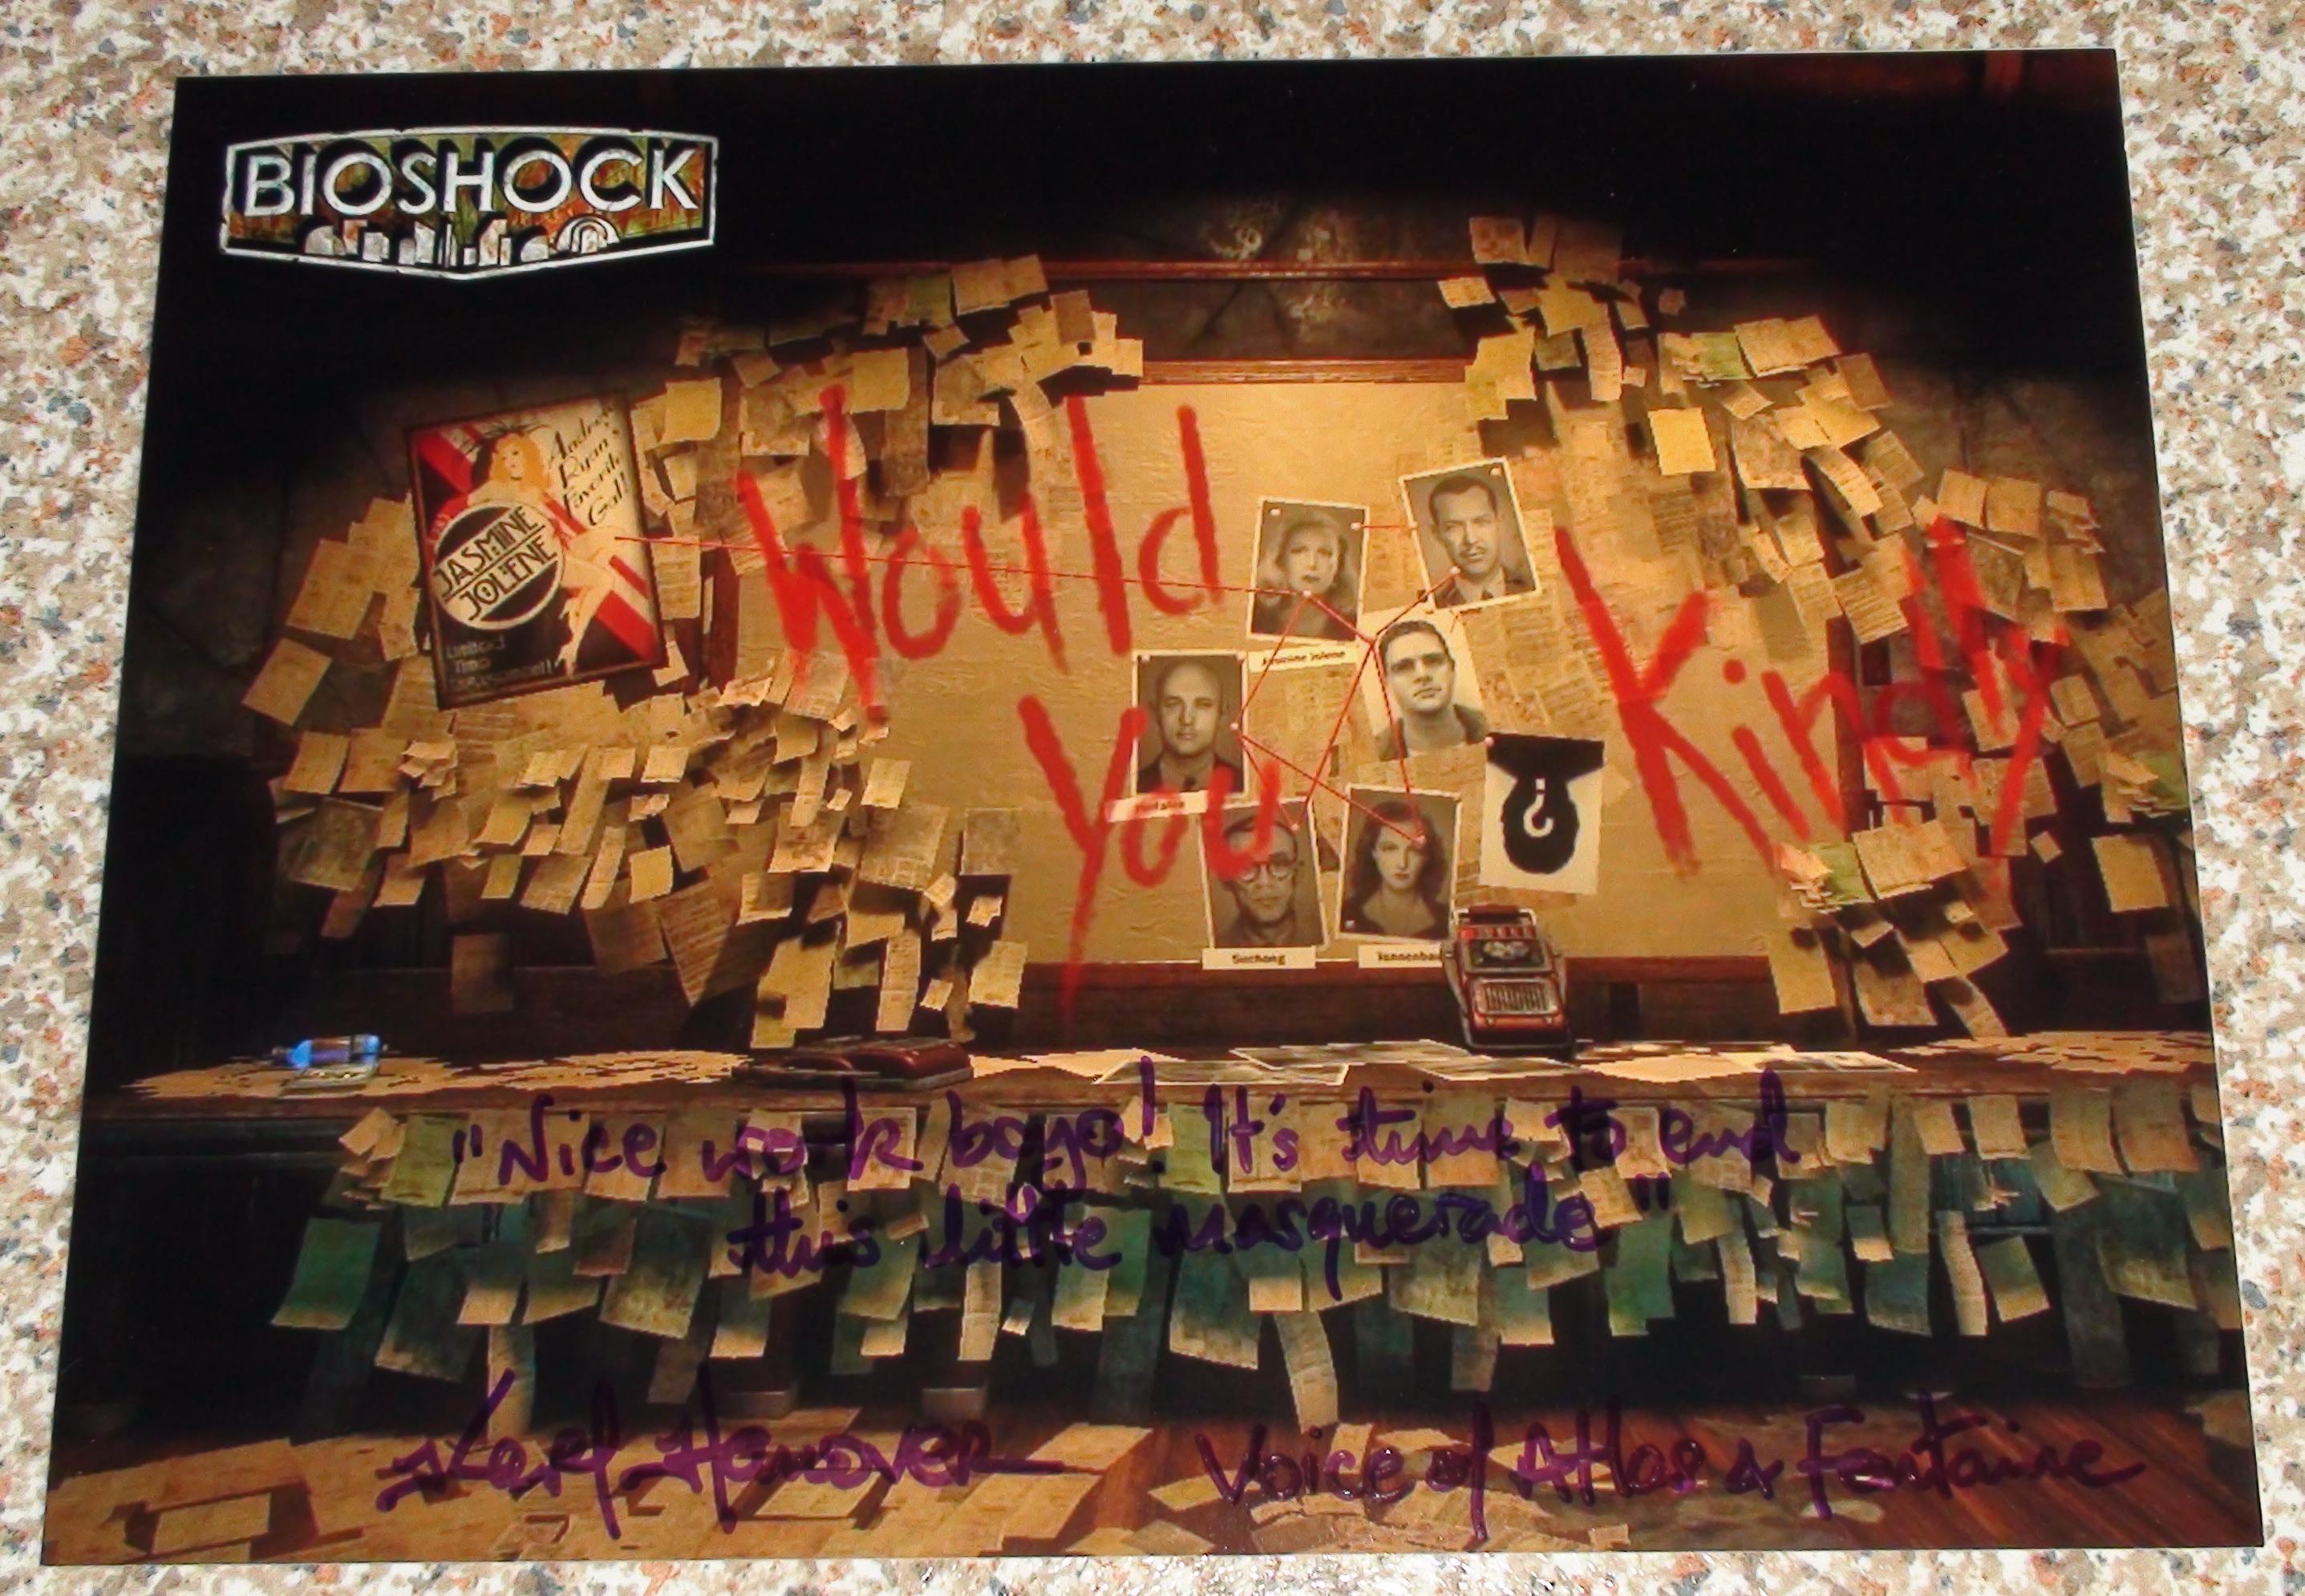 Bioshock - Karl Hanover 1/2